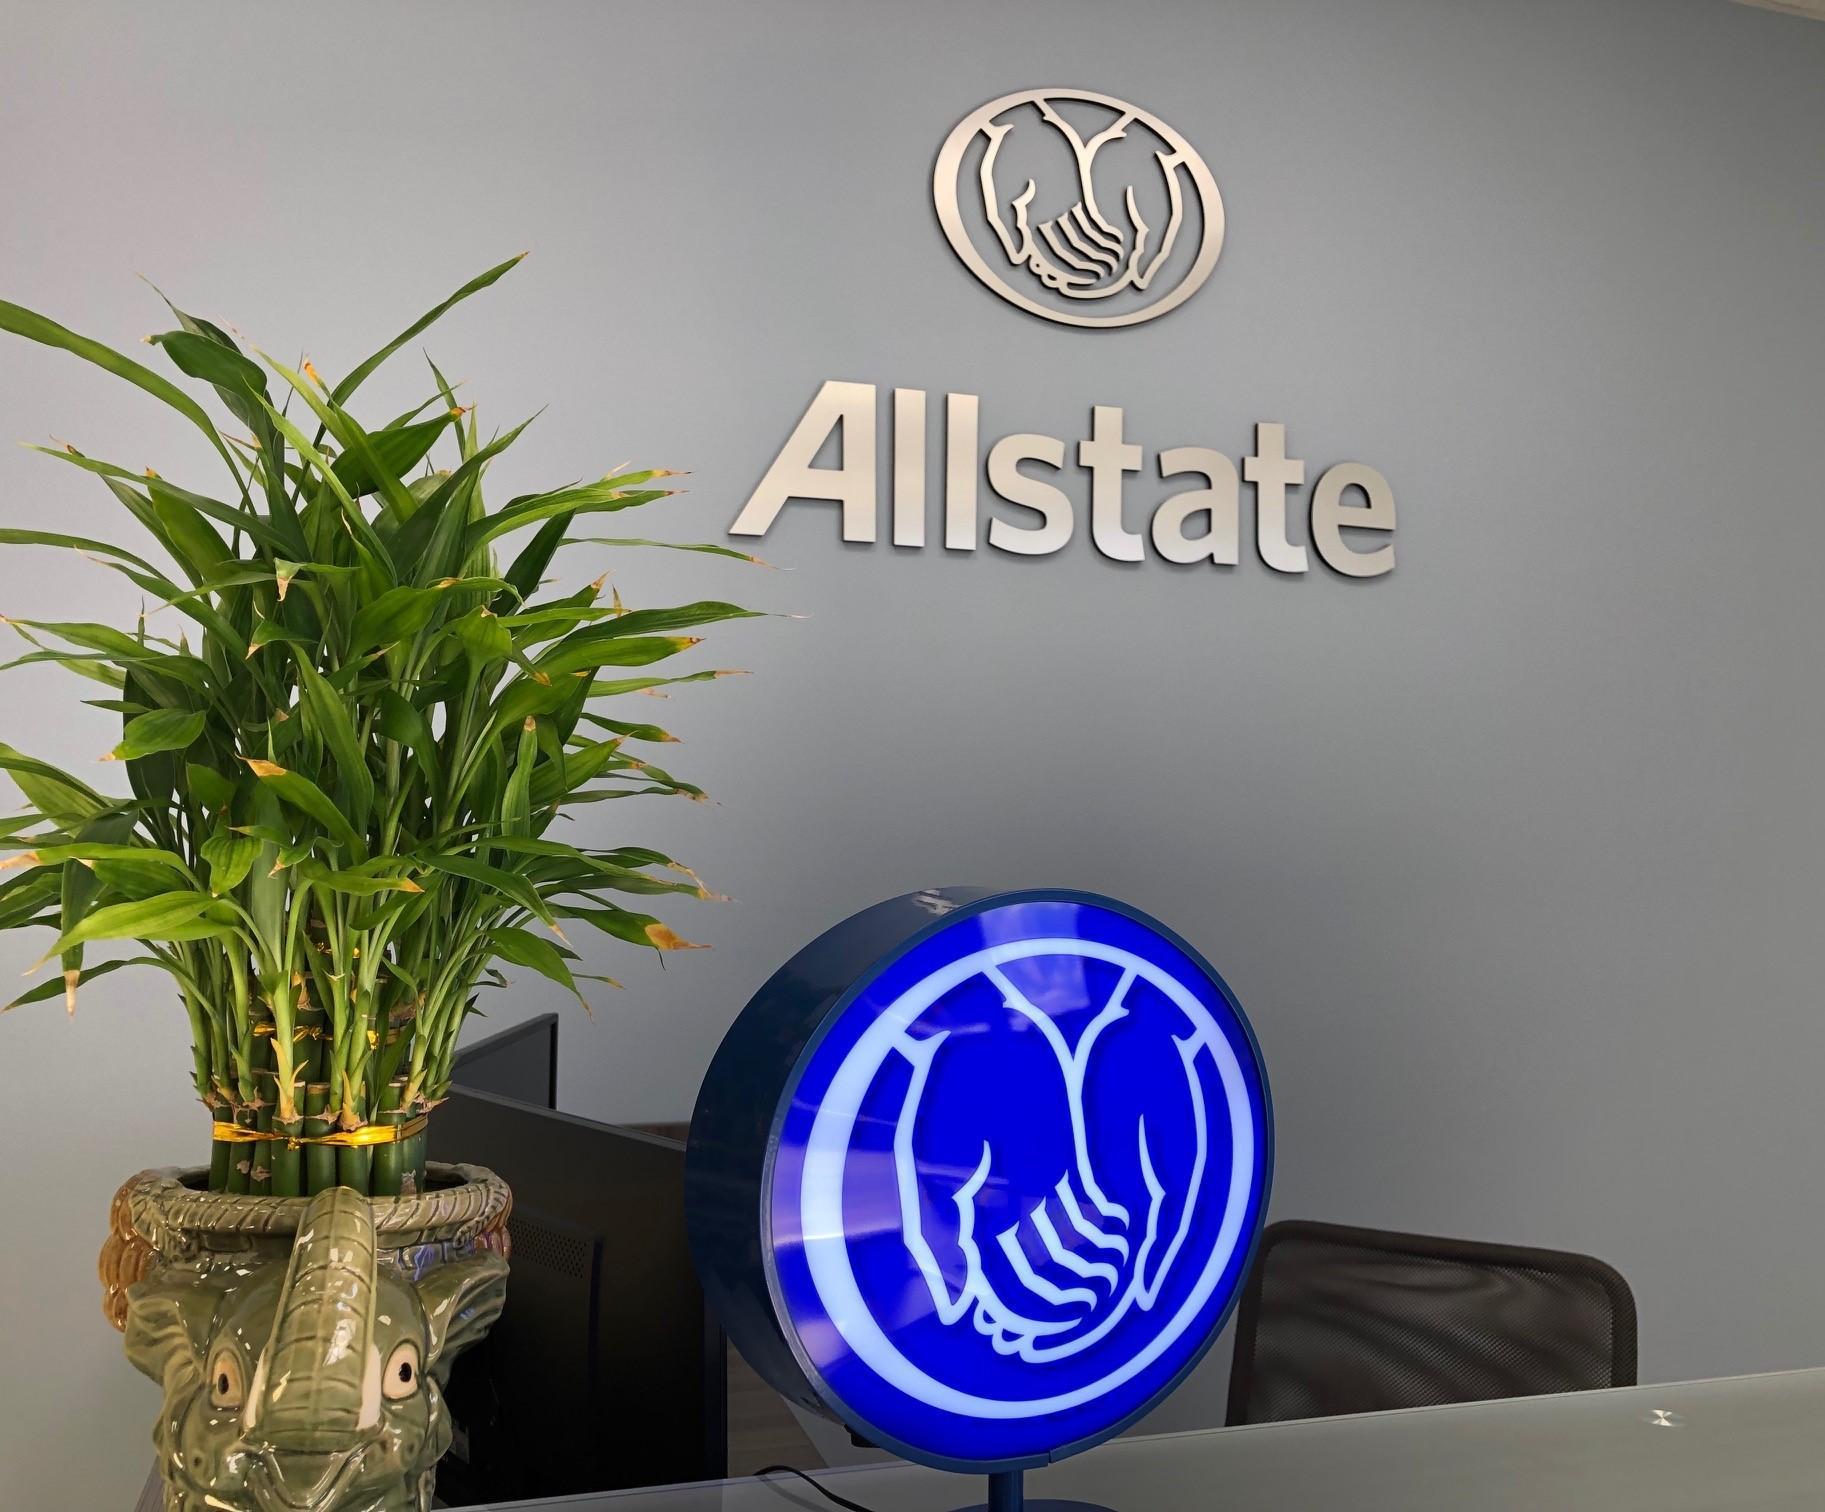 Allstate | Car Insurance in Alhambra, CA - Valentina Alek